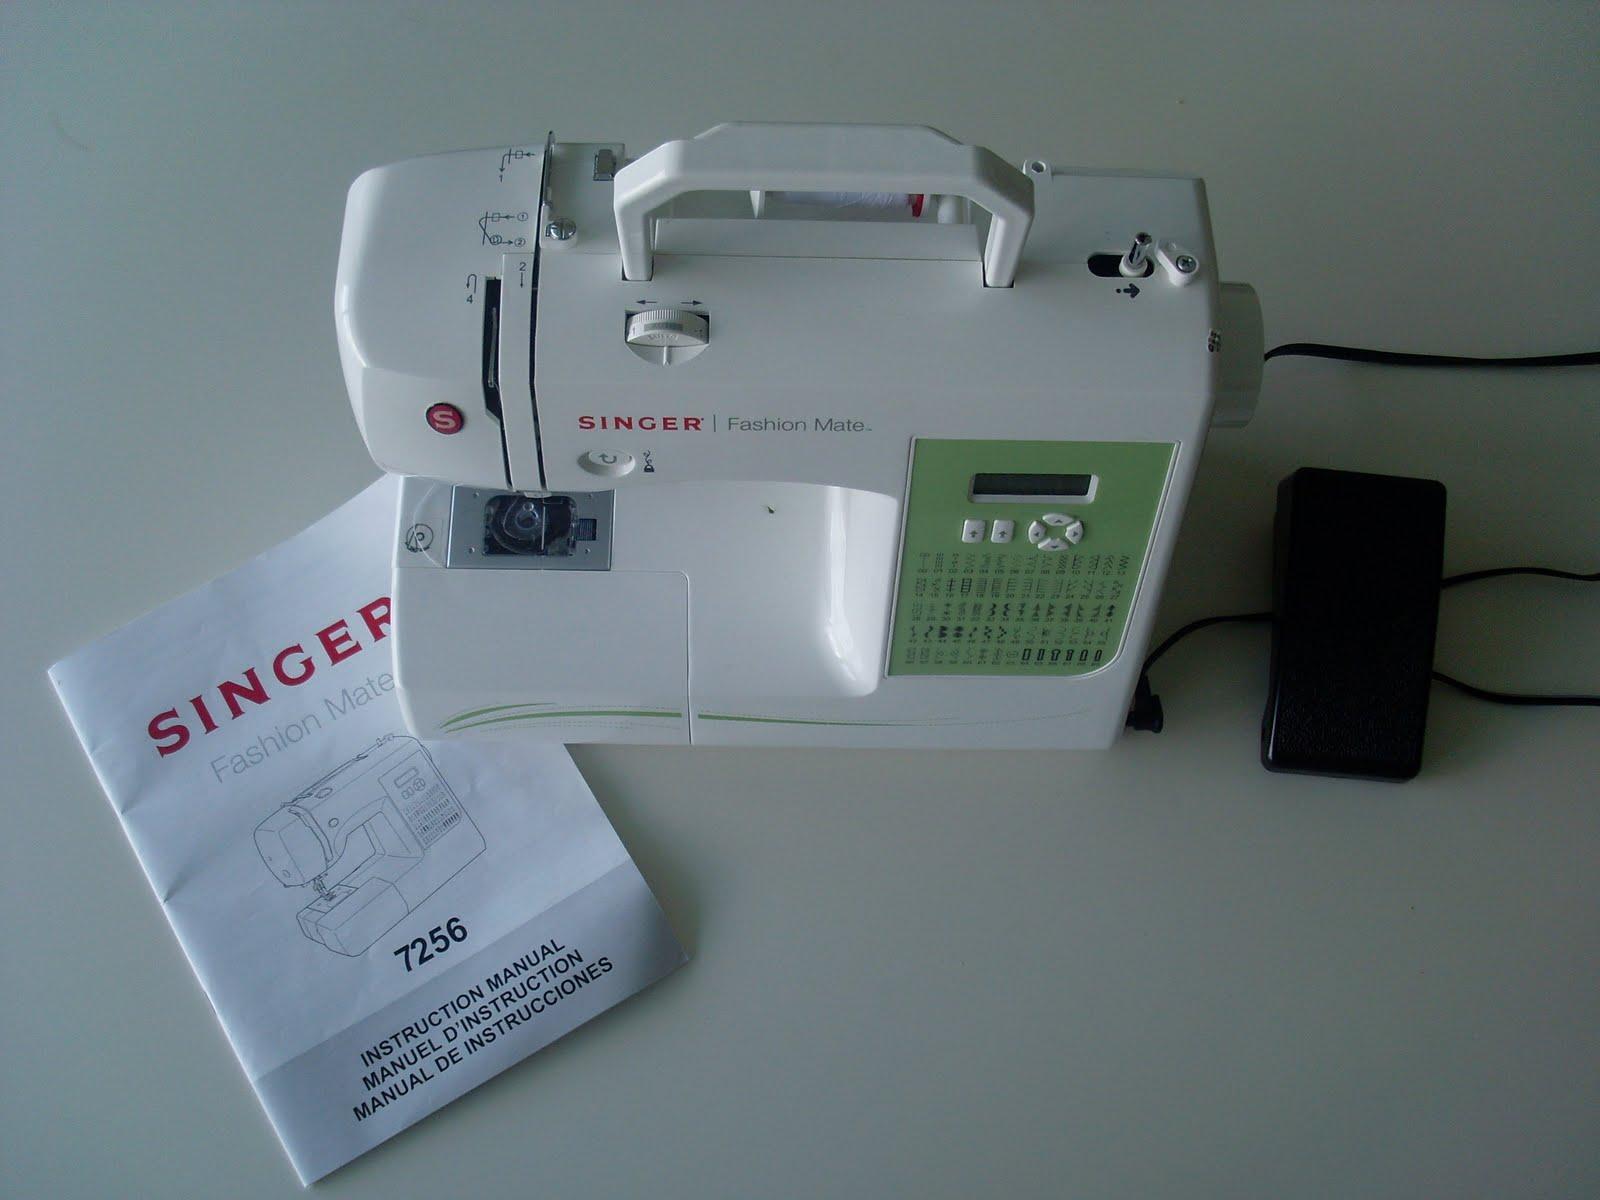 quality design 54256 f55e1 Singer sewing machine fashion mate 252